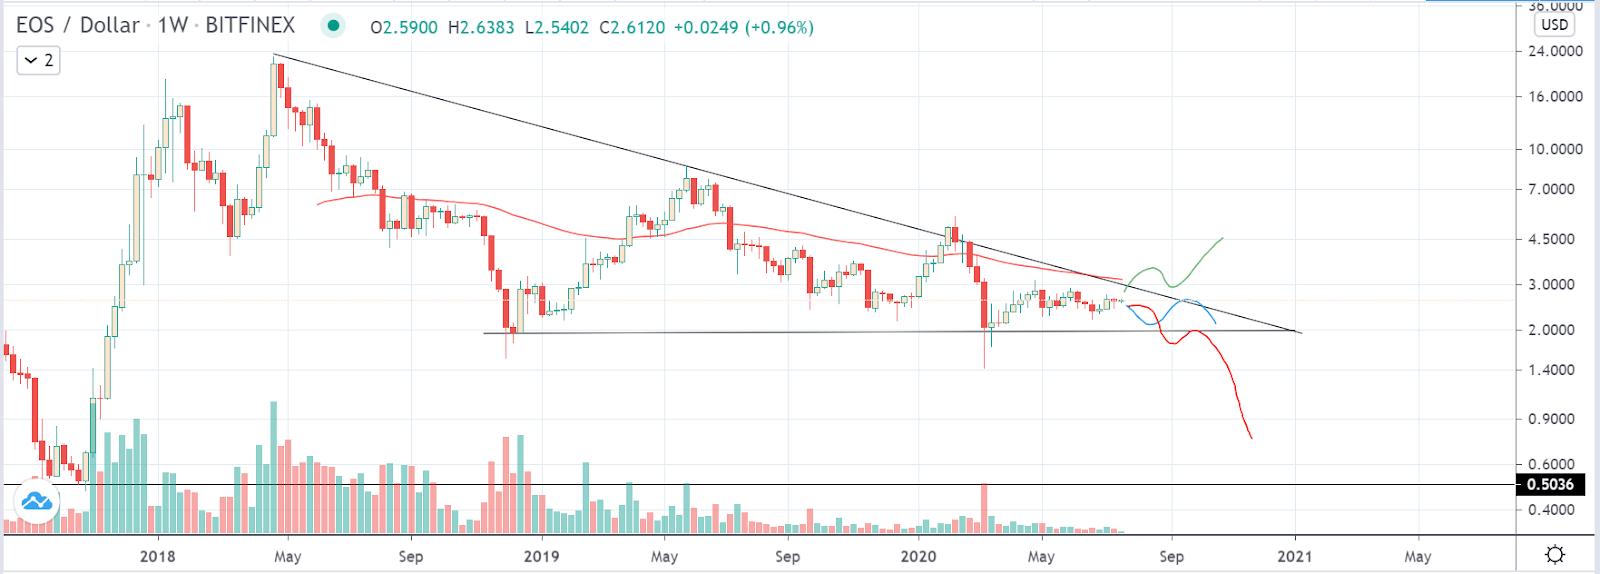 EOS/USD Weekly Chart on Binance (TradingView)